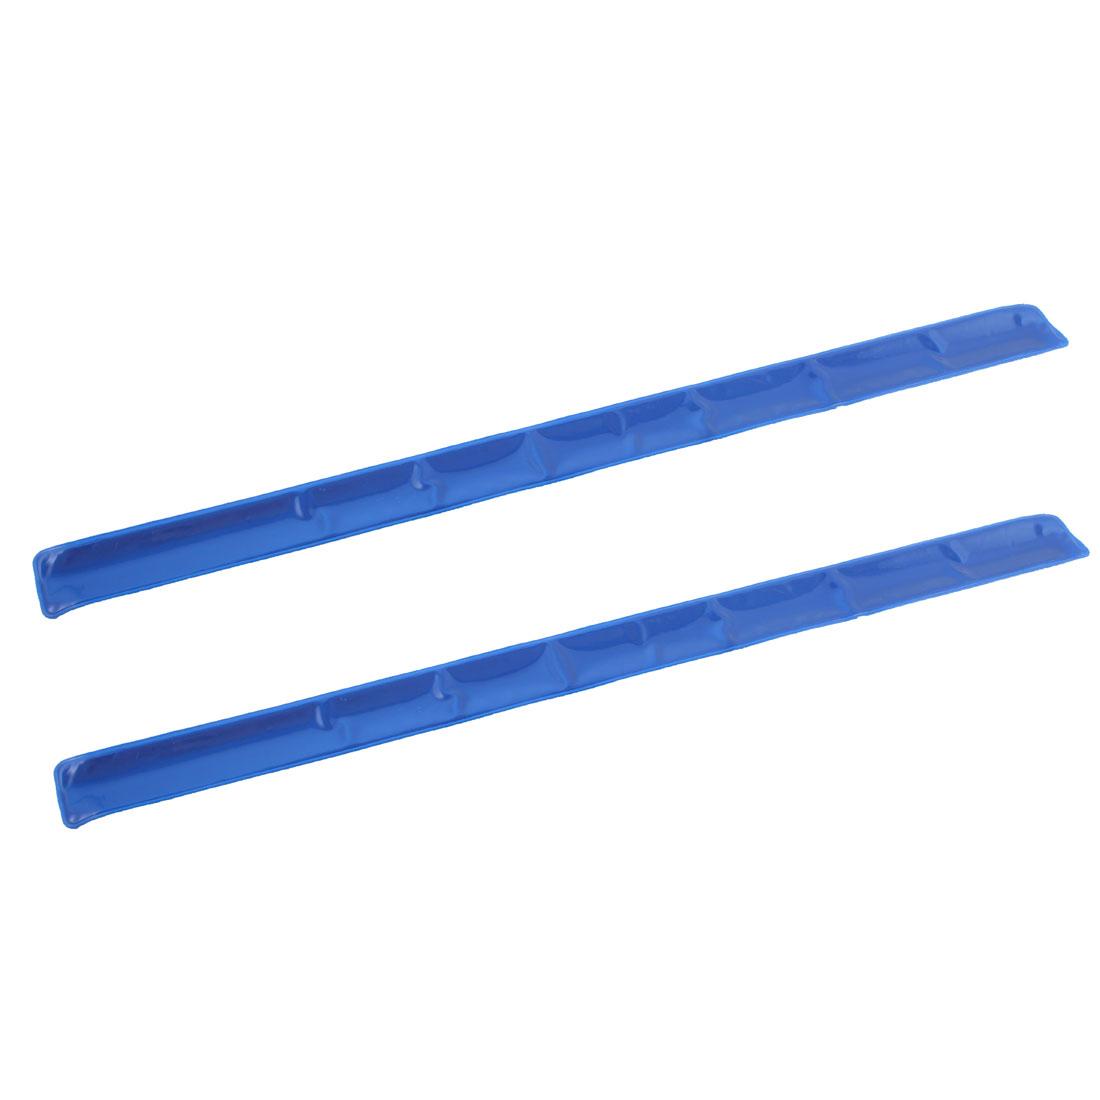 Cycling Running Night Glow Reflective Slap Wrap Bracelets Wristbands Blue 2 Pcs